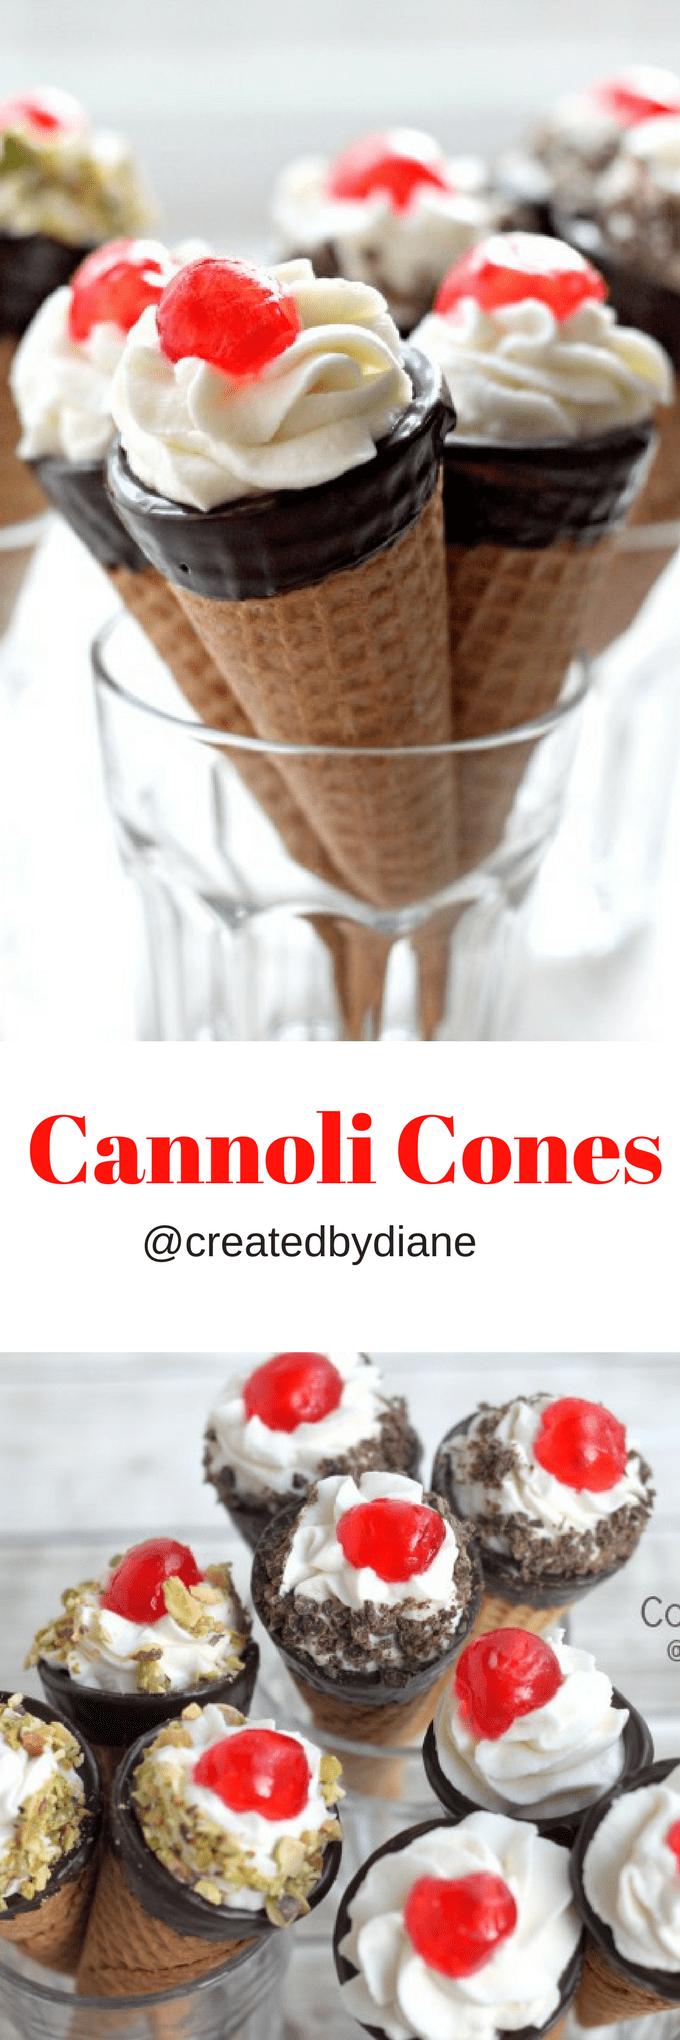 cannoli cones @createdbydiane